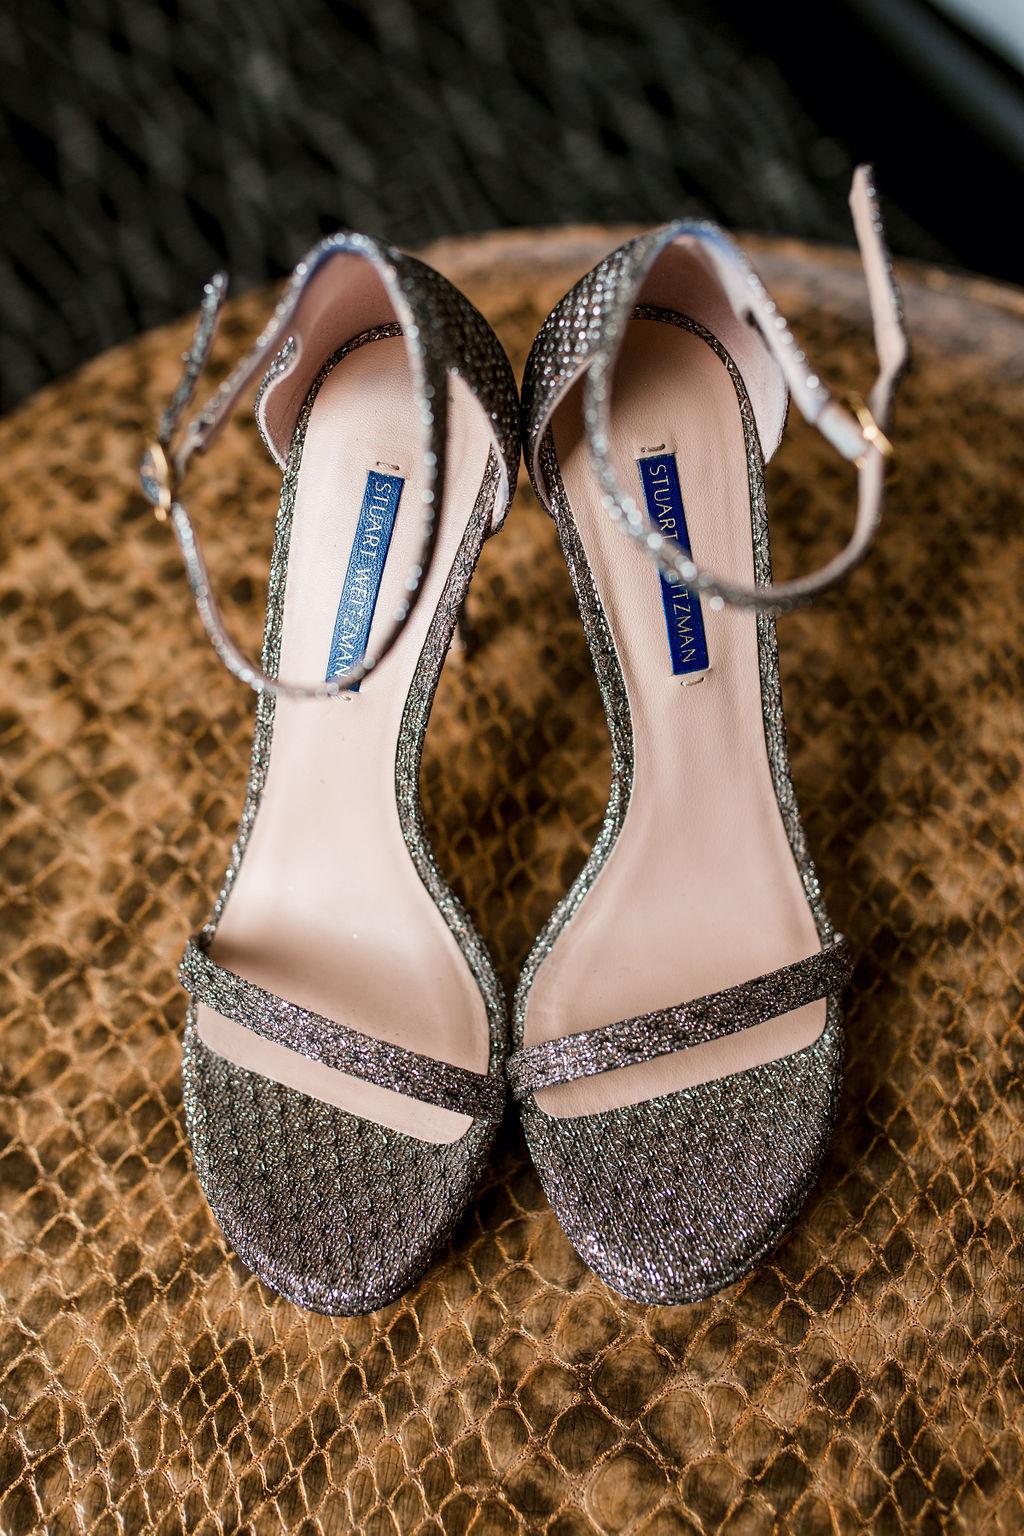 Strappy Wedding Shoes: Lavish Union Station Hotel Wedding featured on Nashville Bride Guide